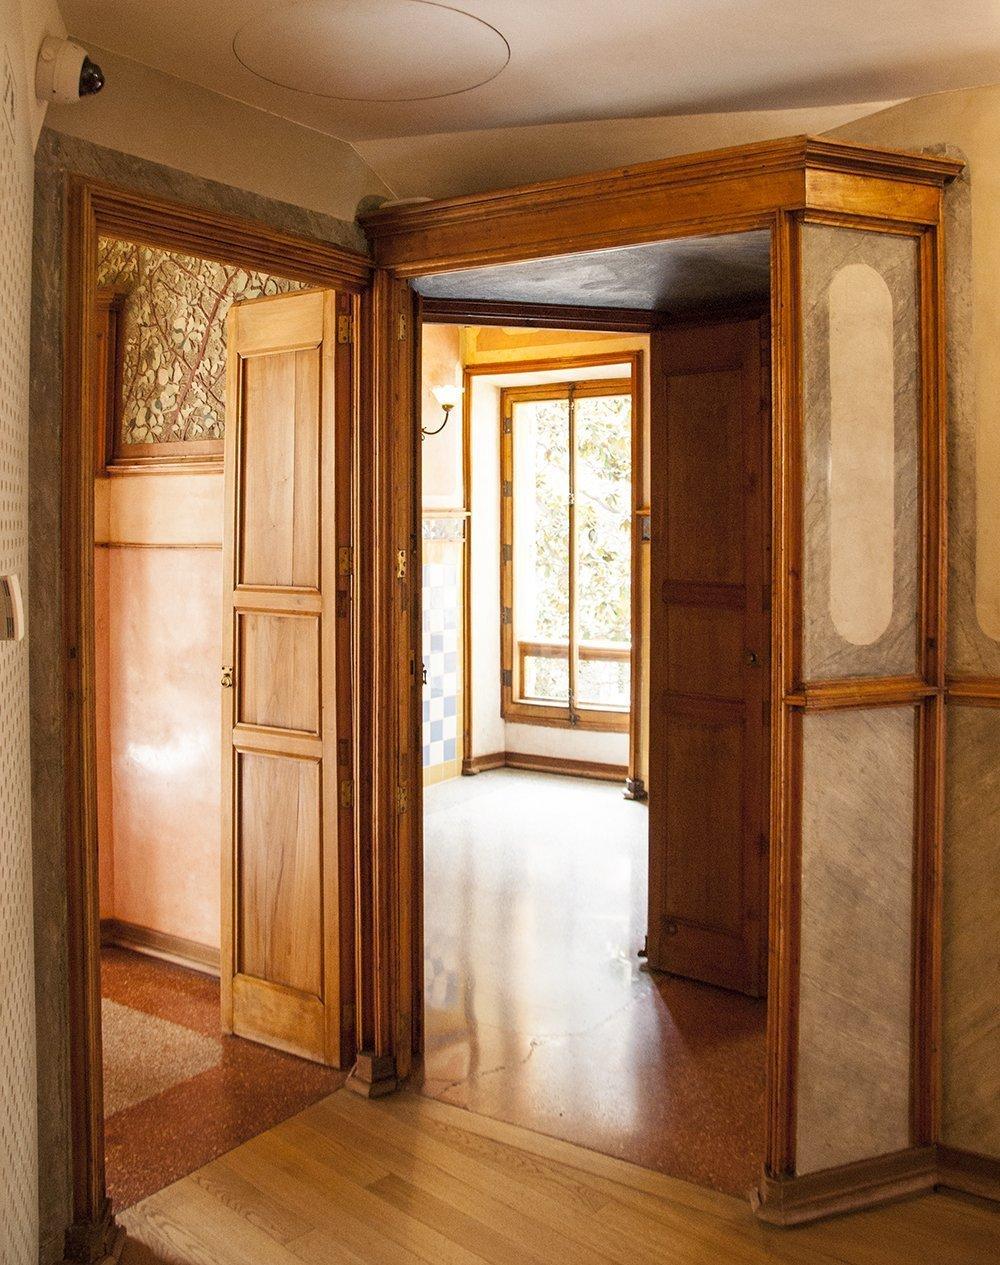 casa vicens barcellona gaudì interno vestibolo